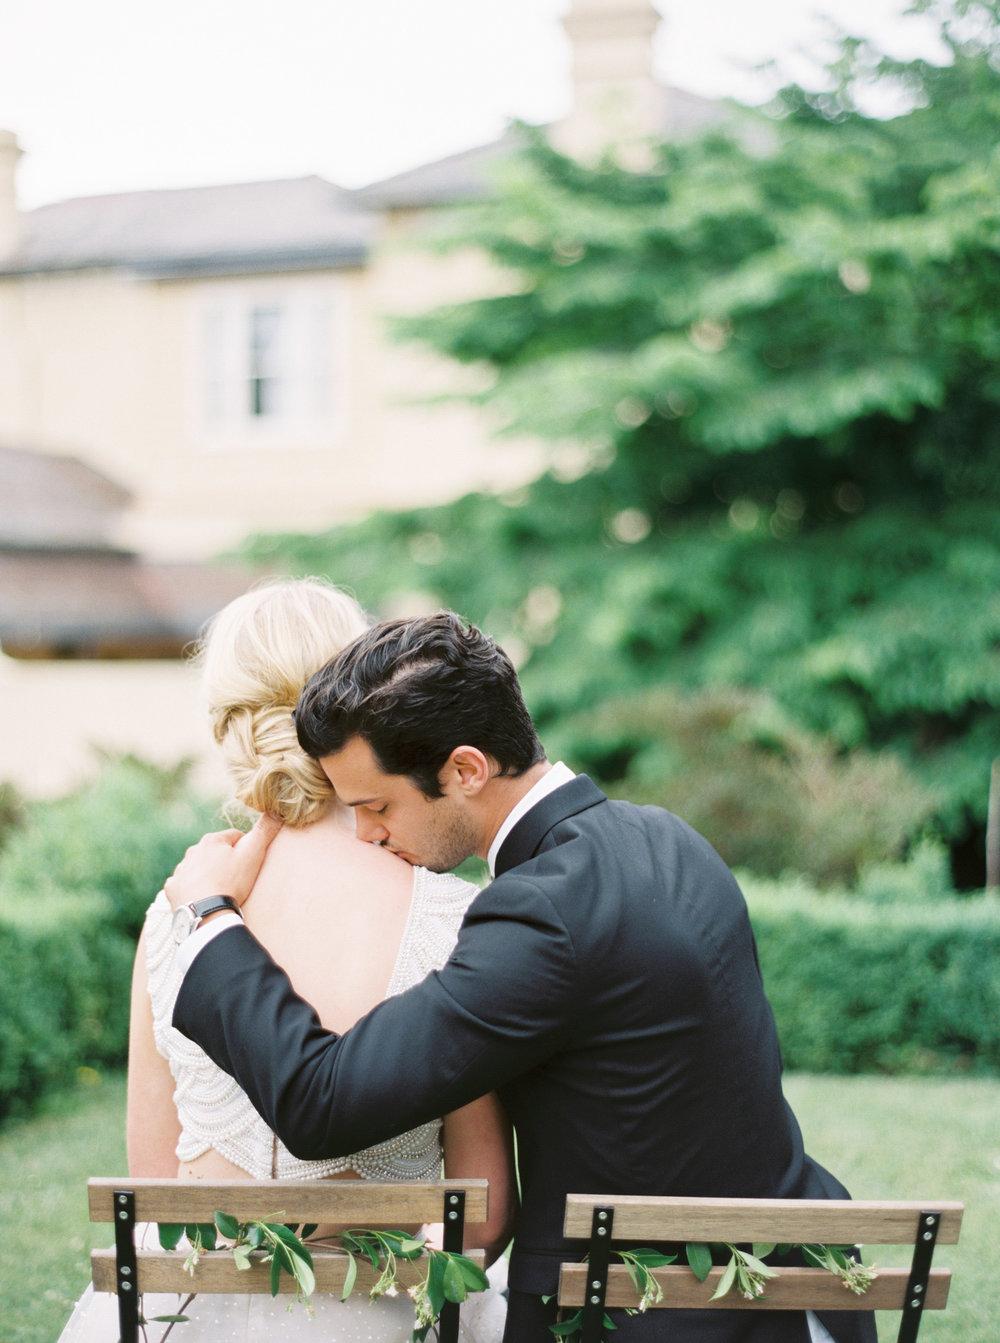 Timeless Southern Highland Wedding Elopement in Bowral NSW Fine Art Film Photographer Sheri McMahon-48.jpg